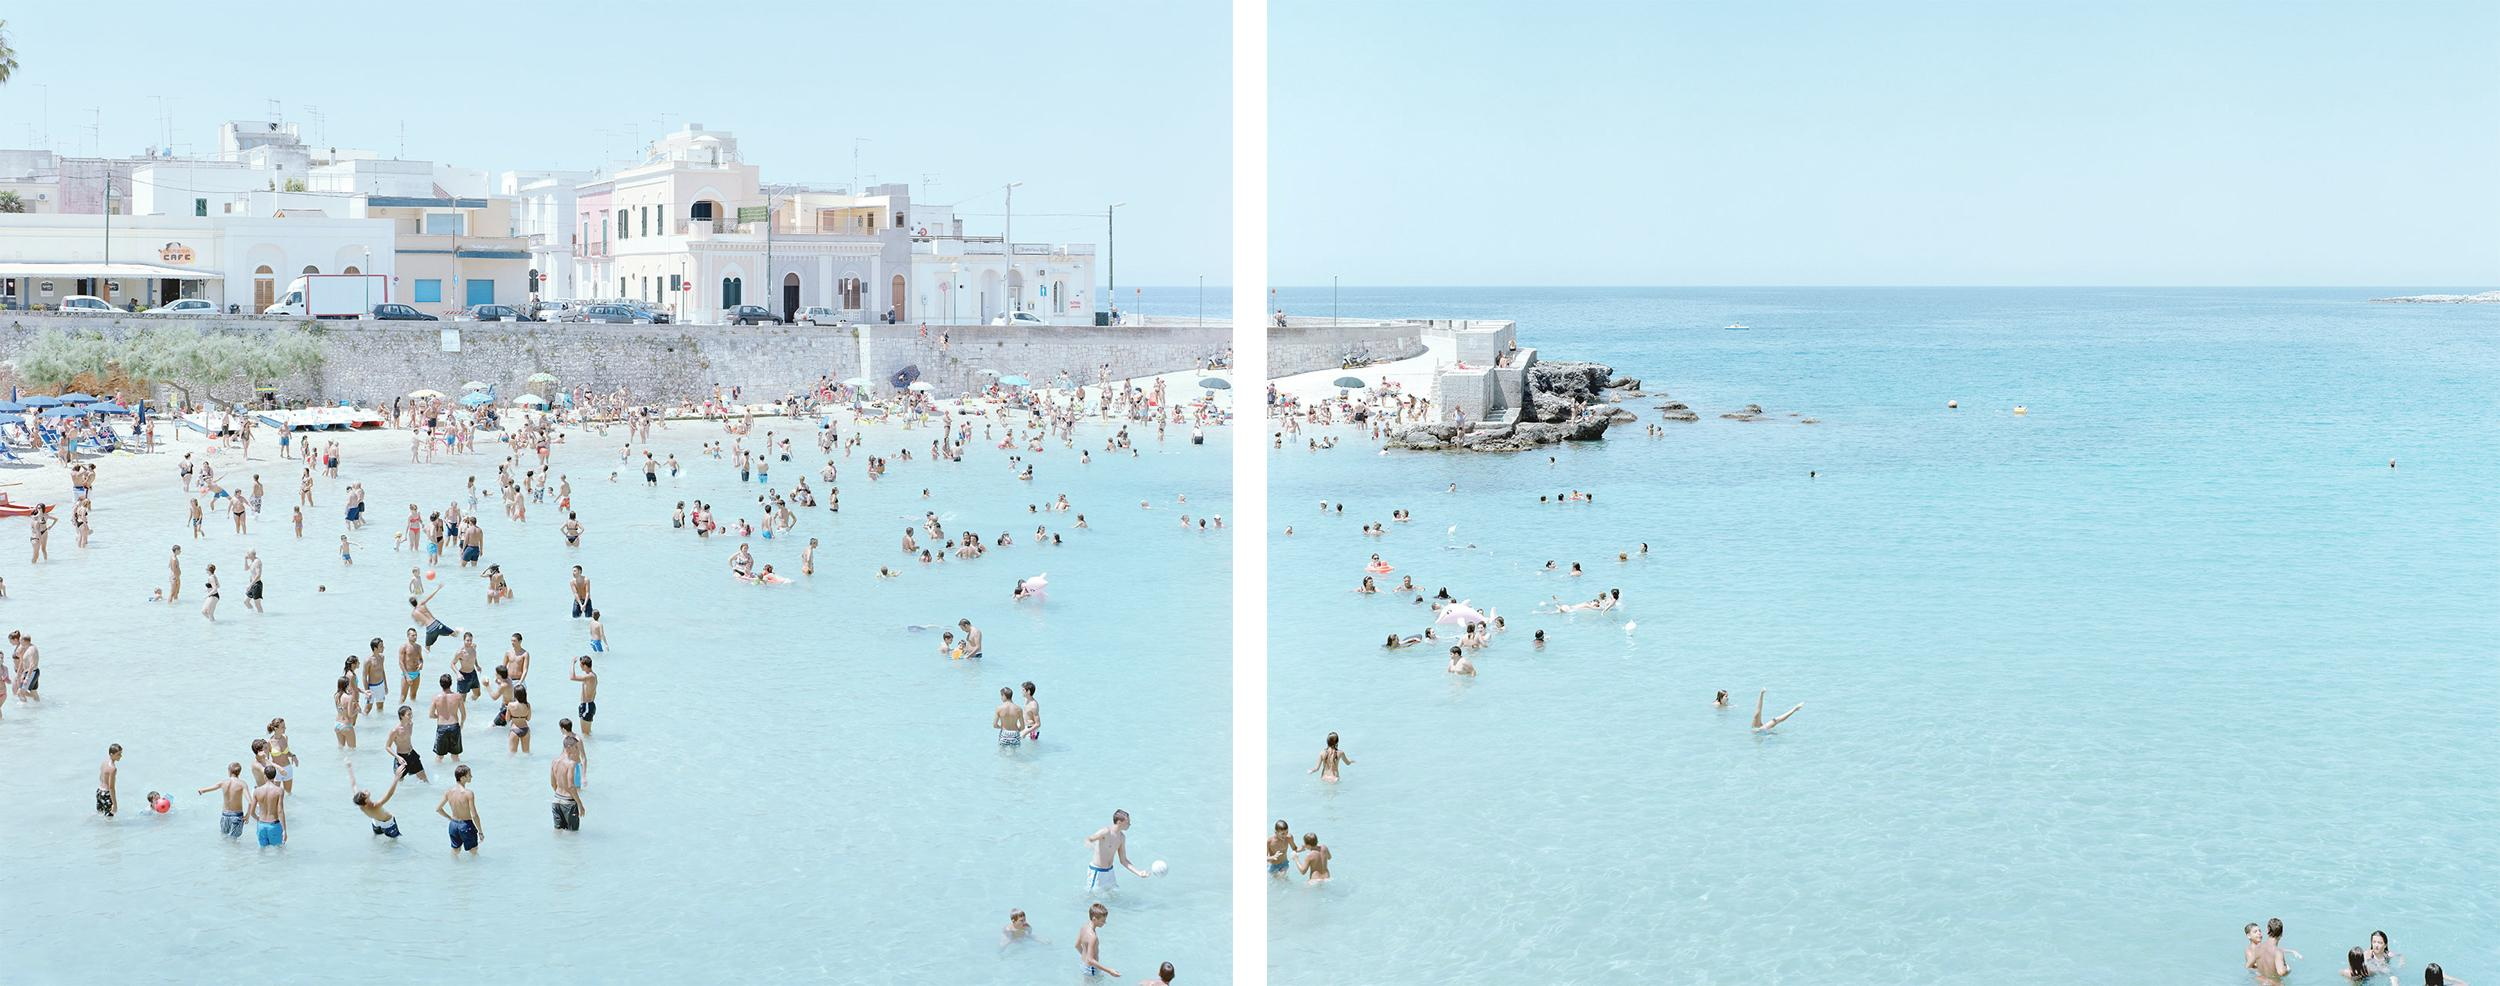 Santa Maria al Bagno diptych - large scale Mediterranean beach scene (framed)